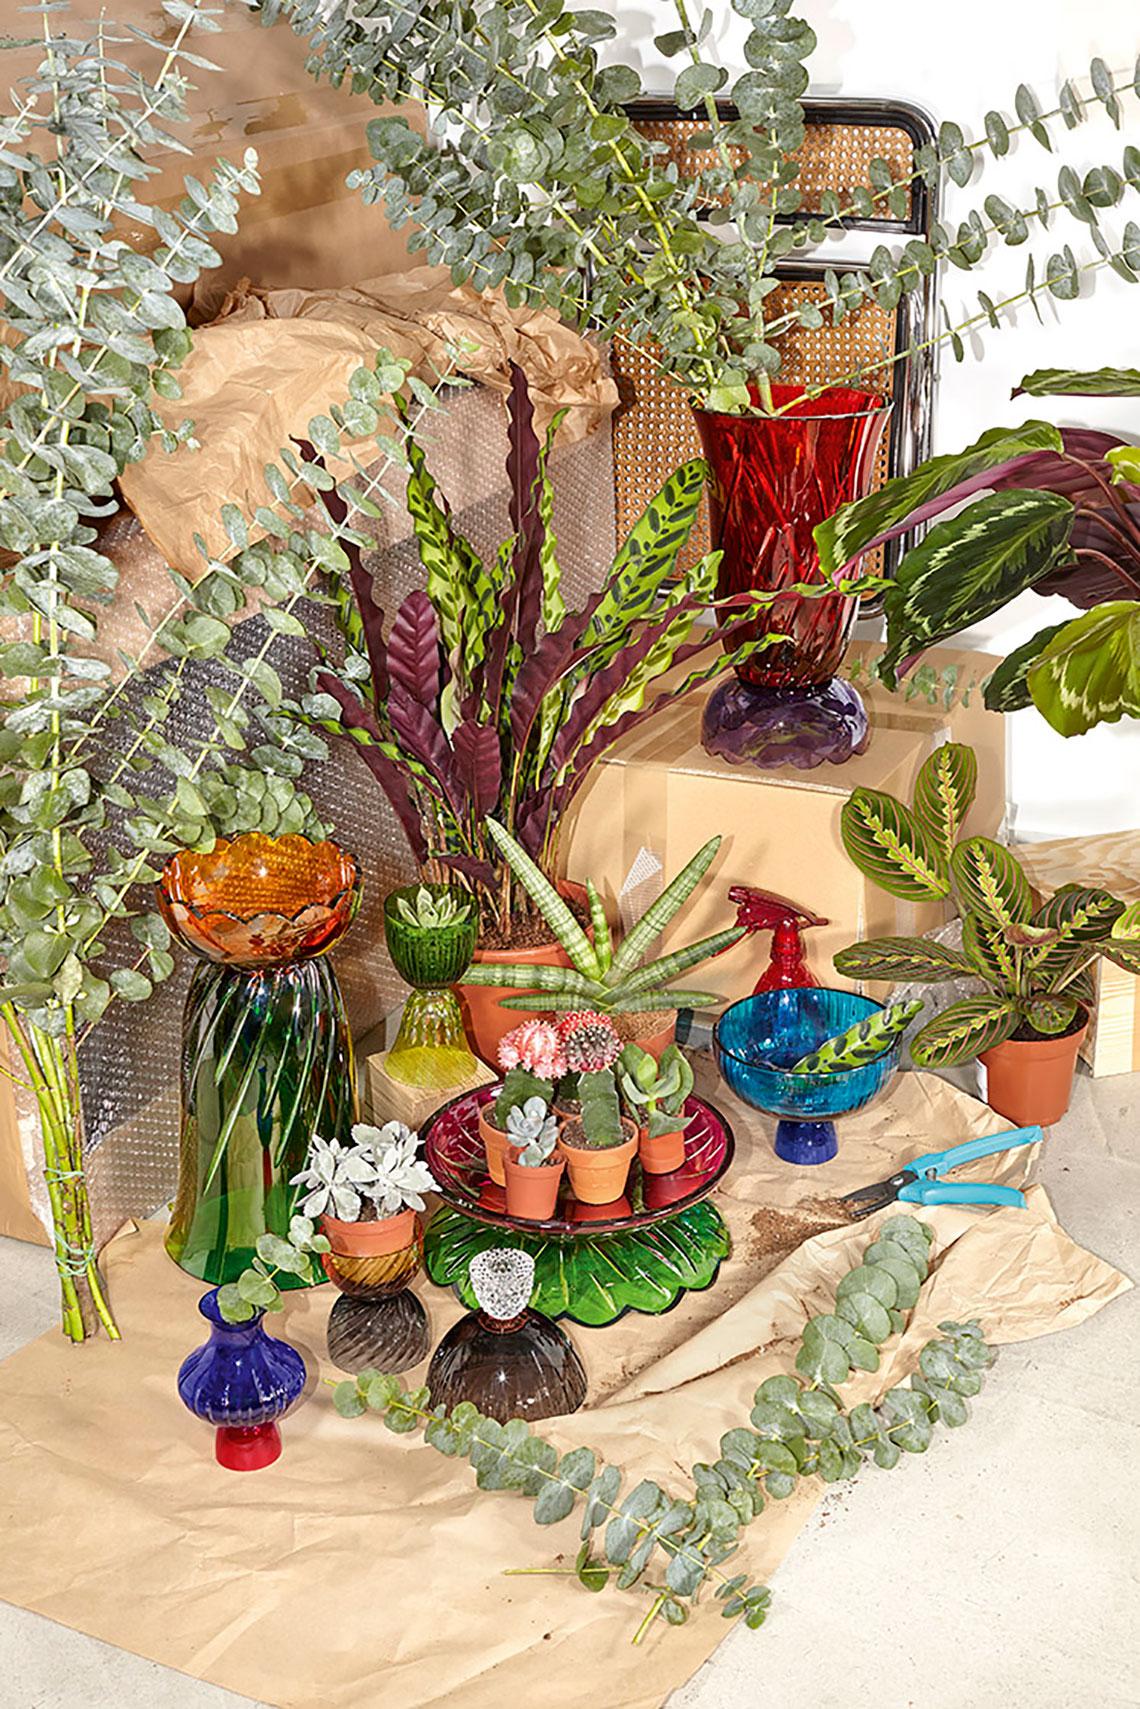 armellelalo-saint-louis-nathalie-mohadjer-plantes